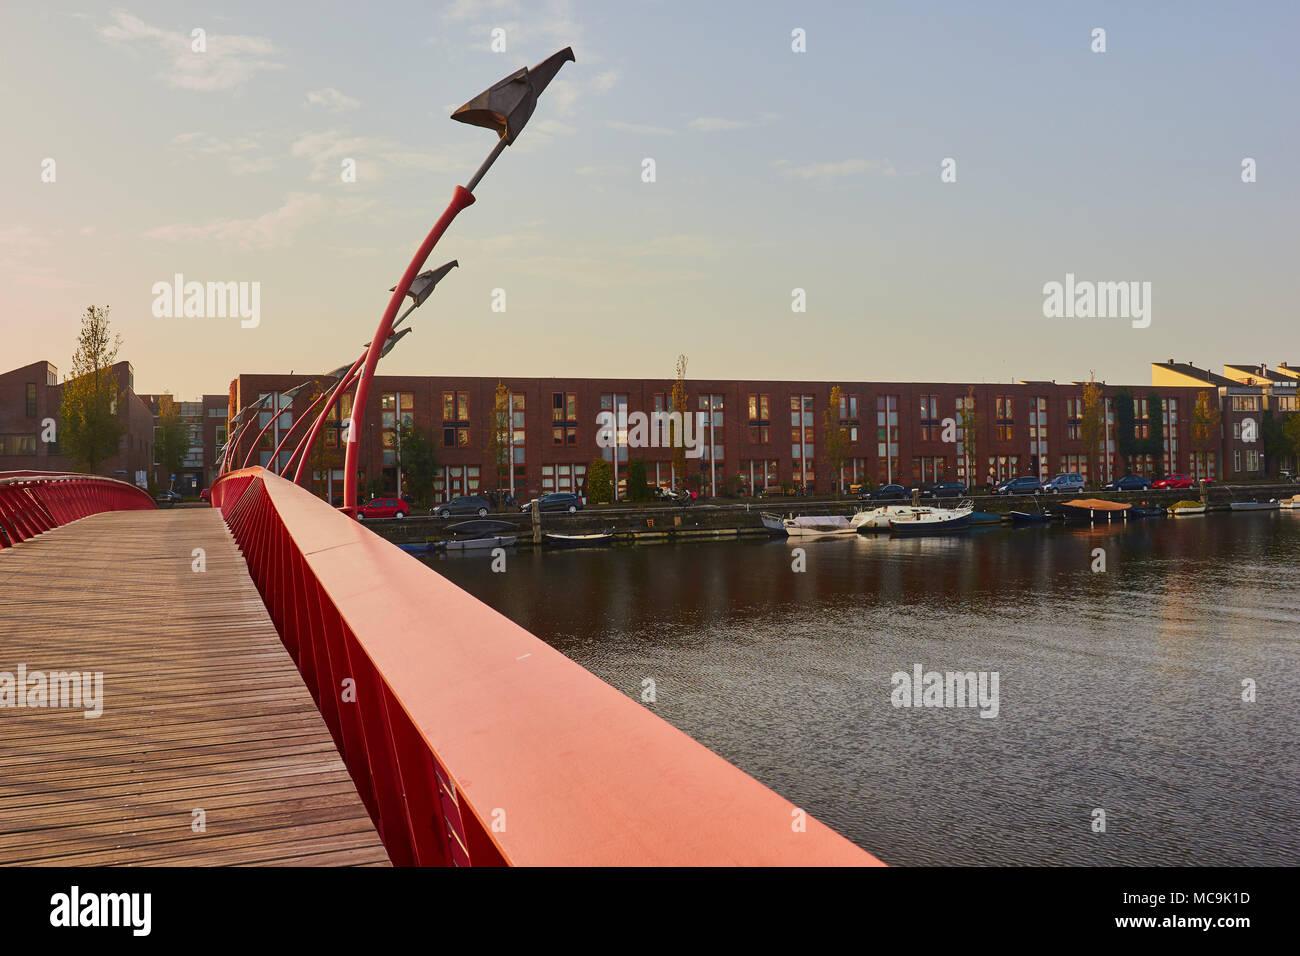 Python Bridge (Pythonbrug), Oosterdokseiland (eastern docklands), Amsterdam, Netherlands. Stock Photo